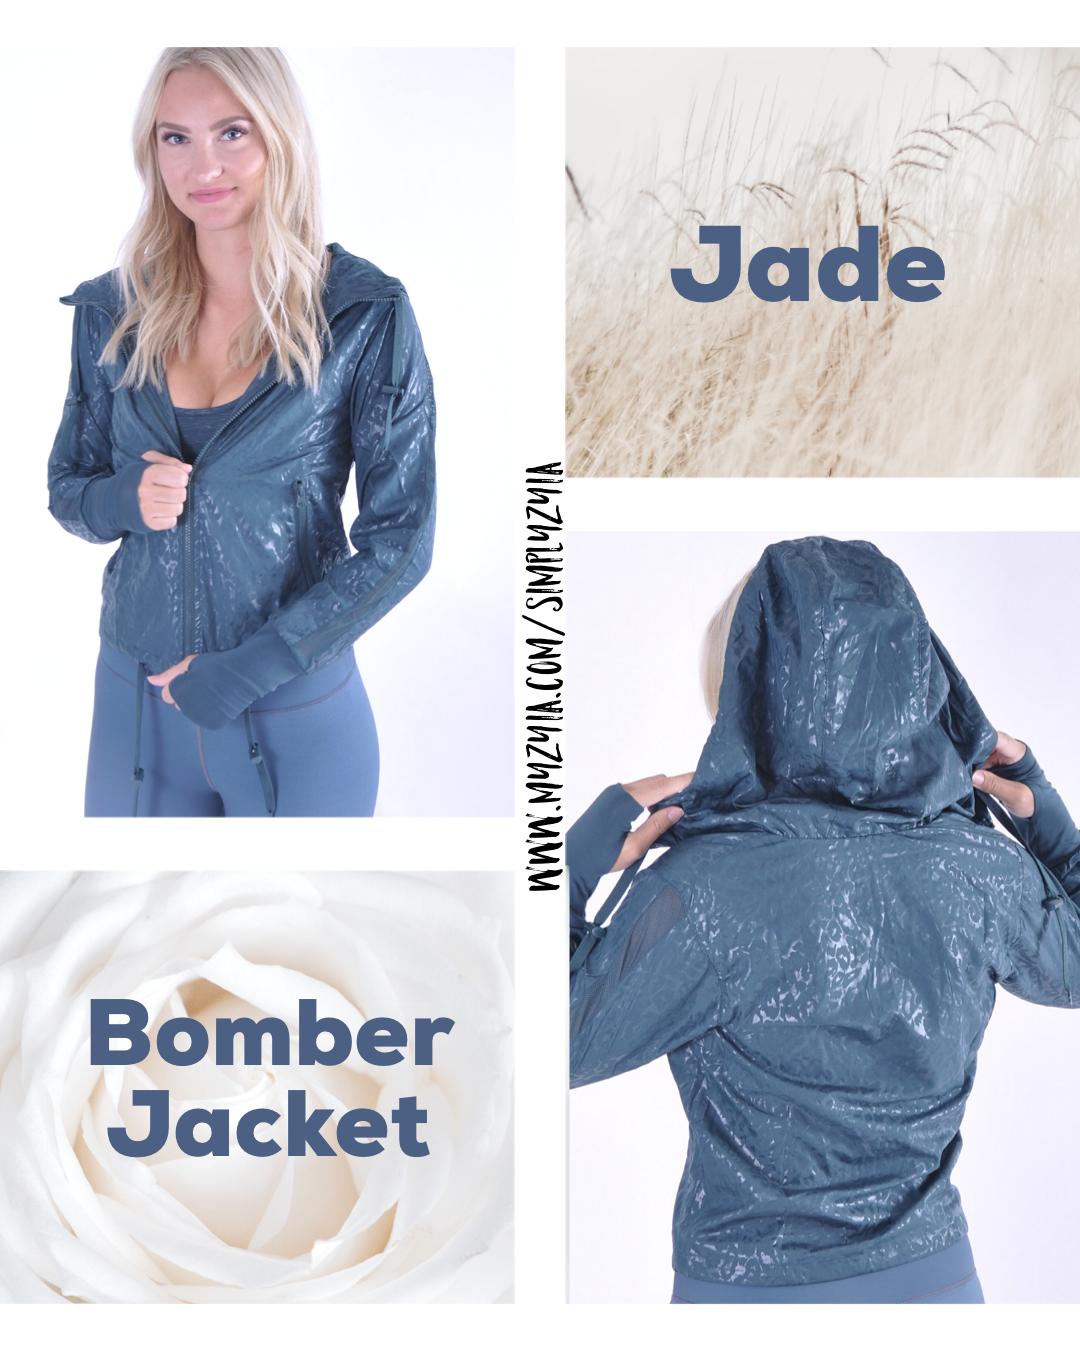 Jade Bomber Jacket Bomber Jacket Jackets Athleisure Wear [ 1350 x 1080 Pixel ]